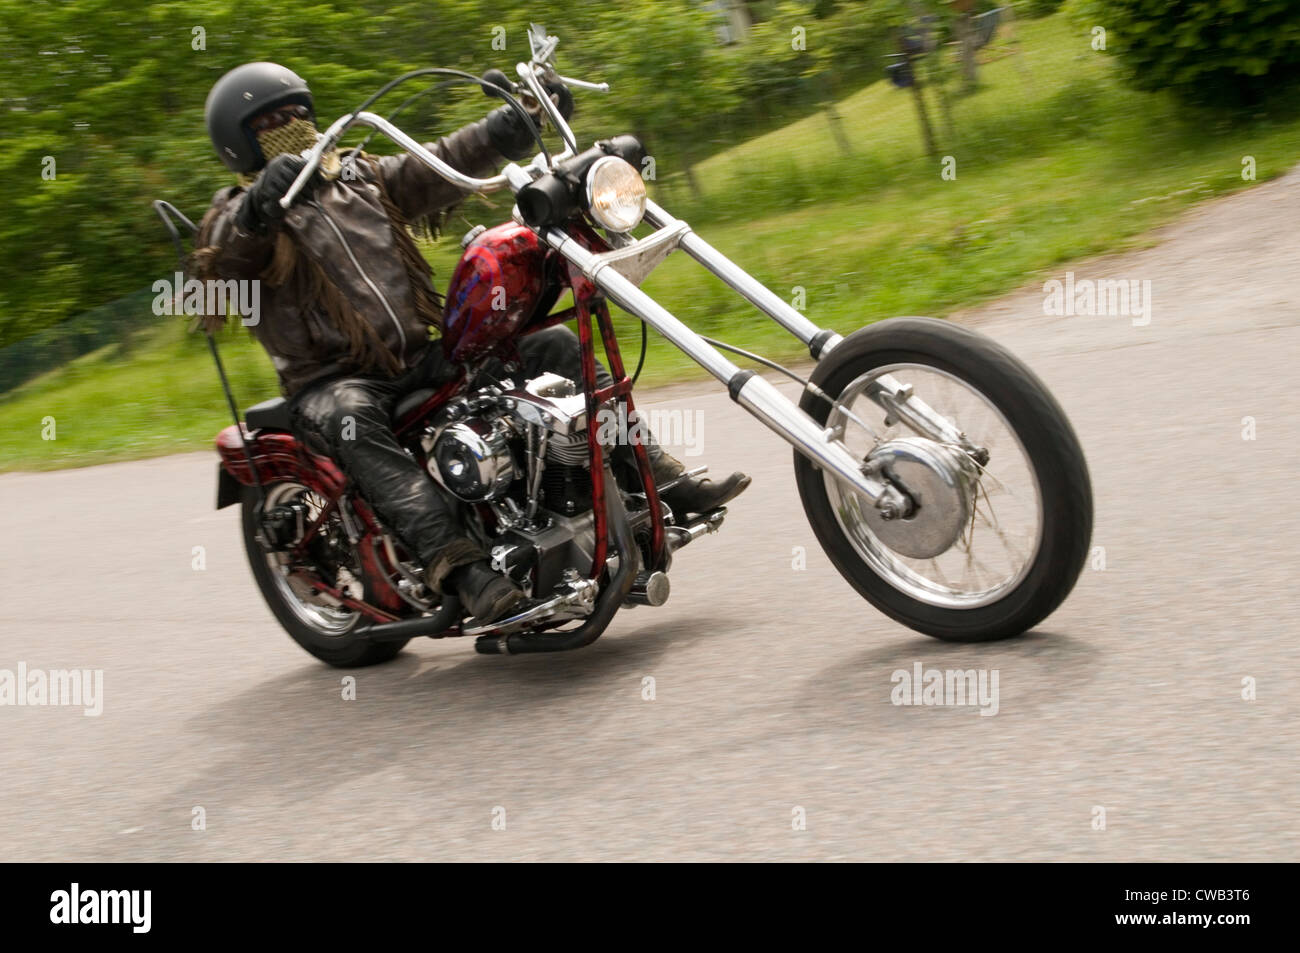 biker bikers ride harley davidson chopper v twin motorcycle motorcycles motor cycle cycles bike motorbike bikes - Stock Image